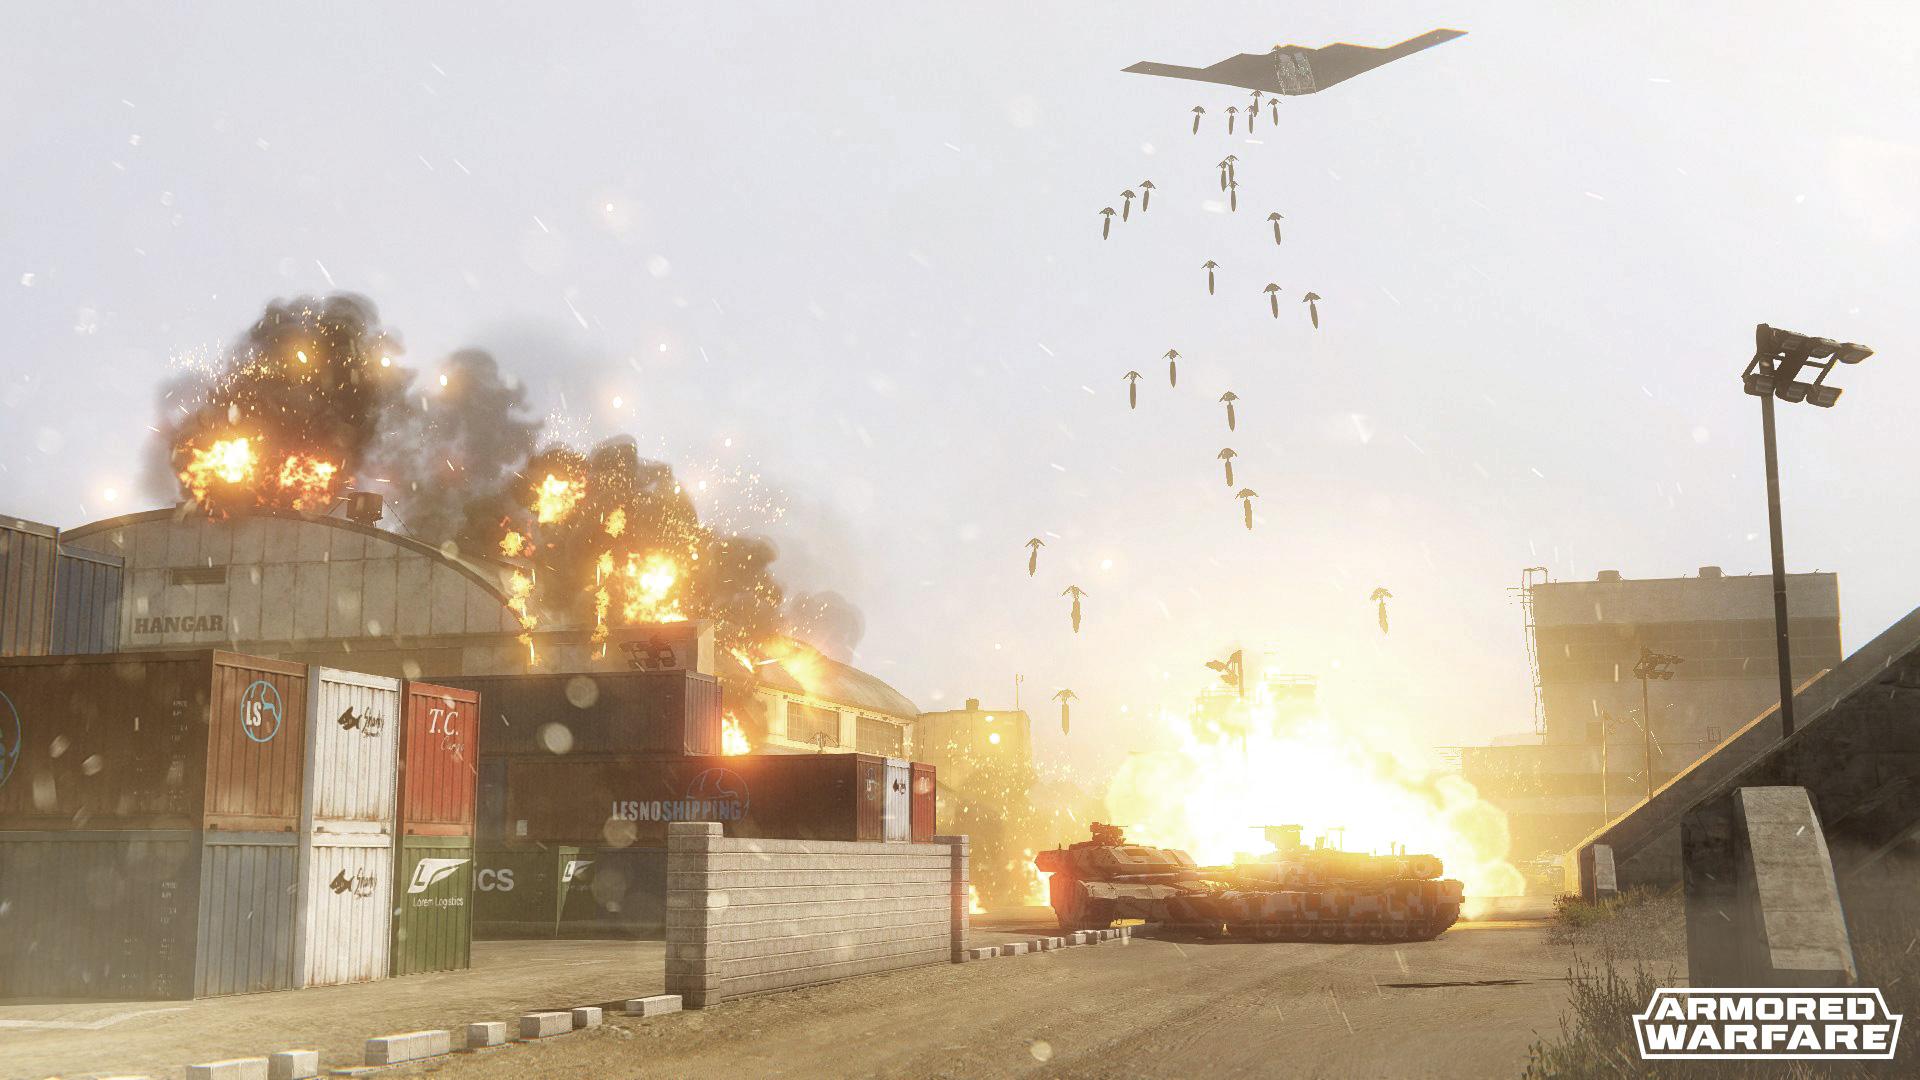 aarmored-warfare-global-operations04